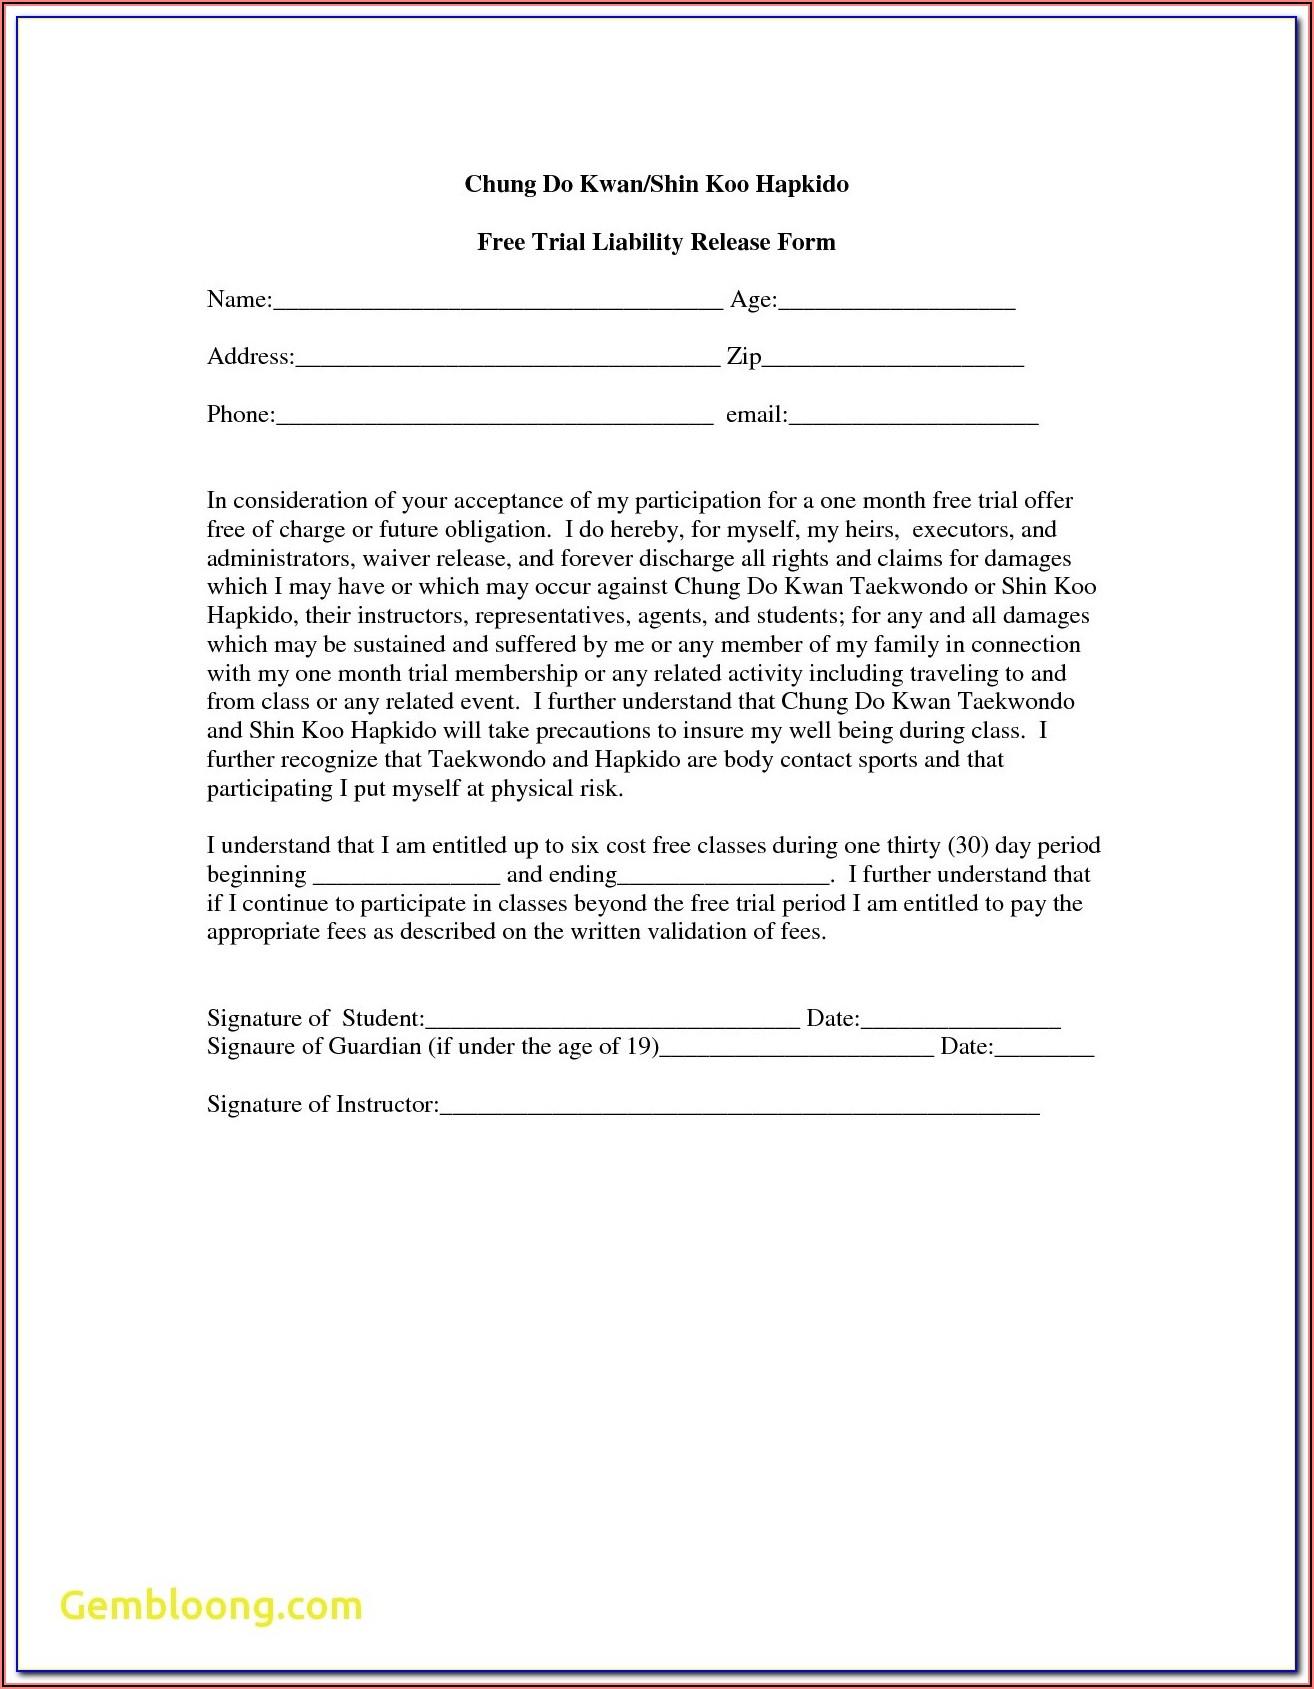 Transfer On Death Deed Form Virginia